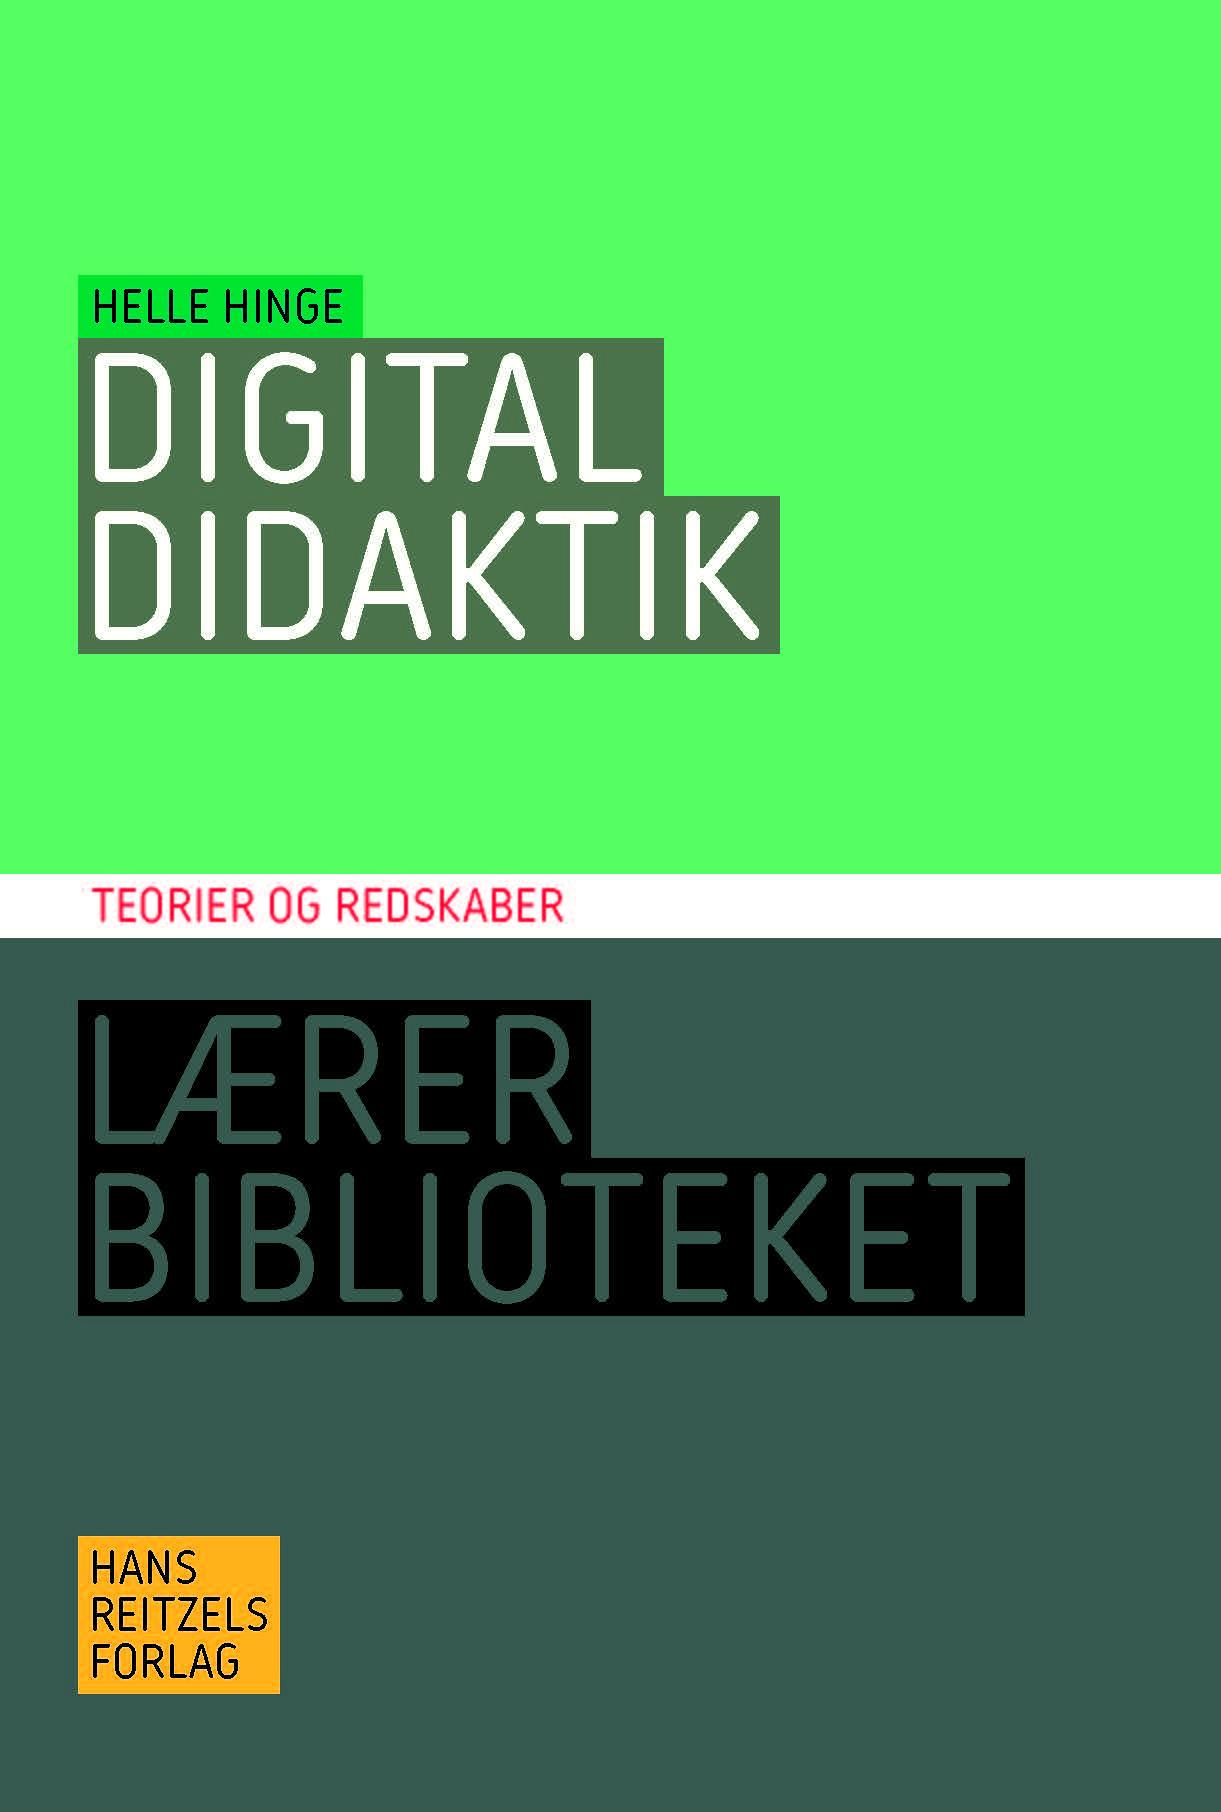 Digital didaktik